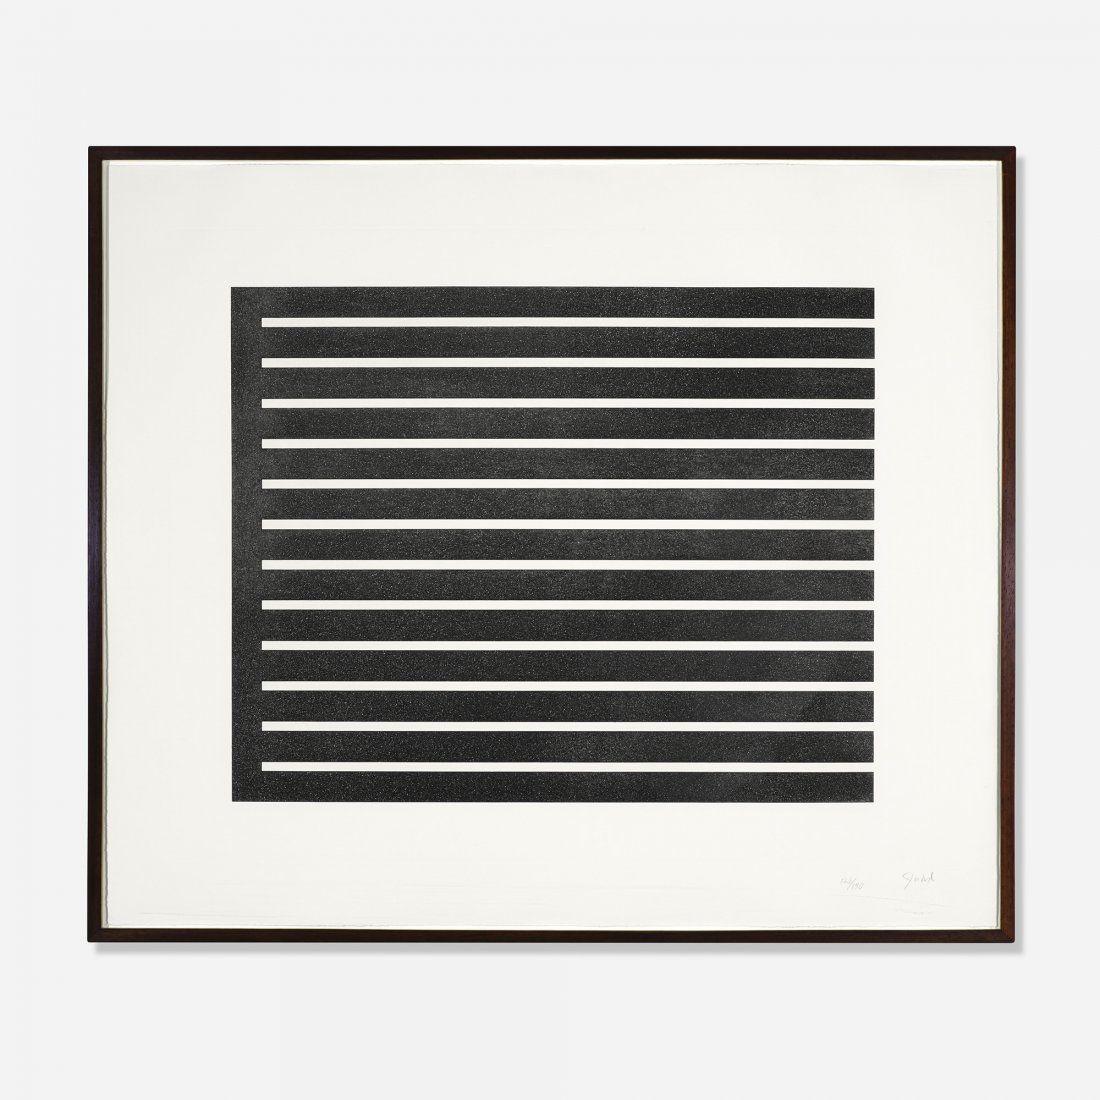 Donald Judd Untitled (121)